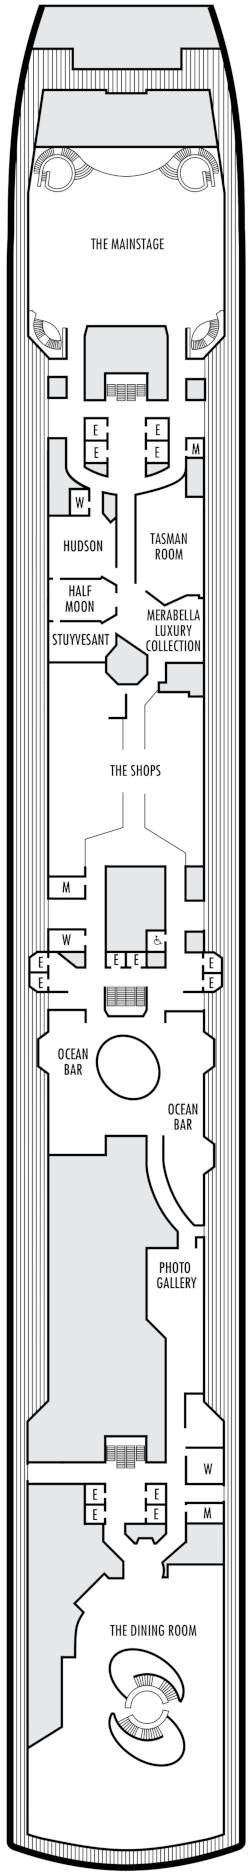 Eurodam Panorama Deck Deck Plan